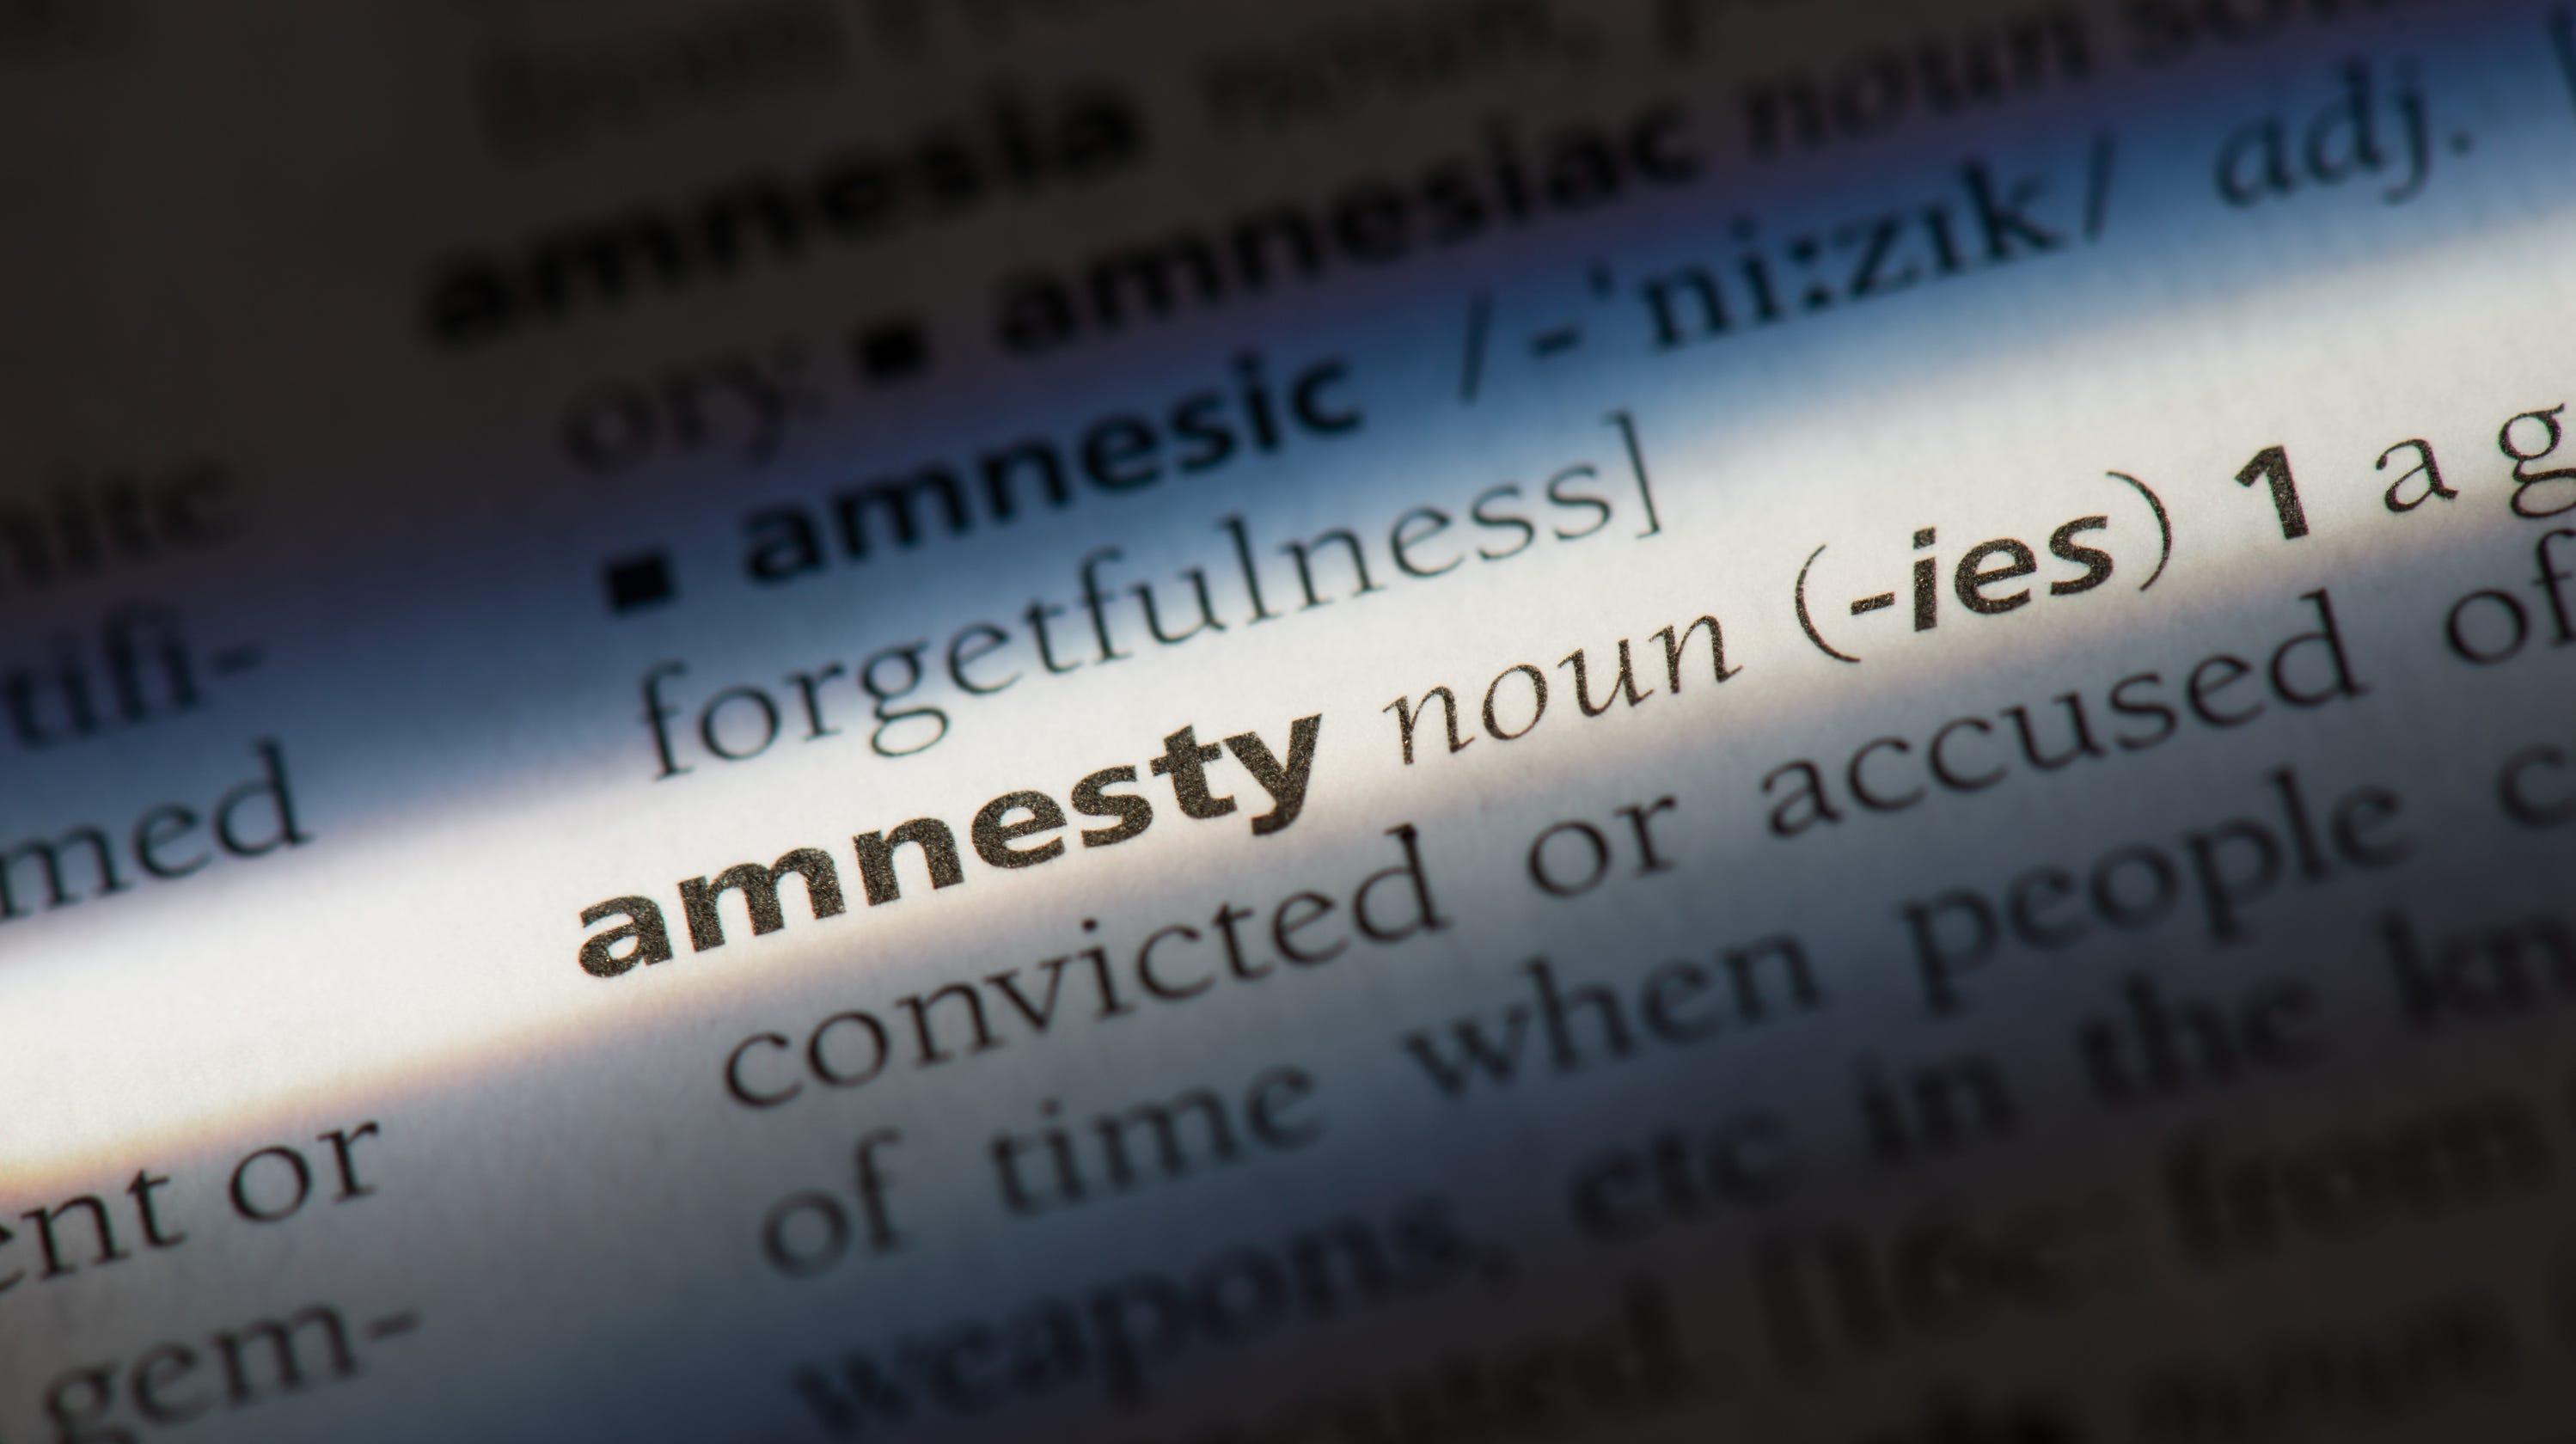 Lakewood Medicaid fraud: Amnesty program may trip up nominee for judge